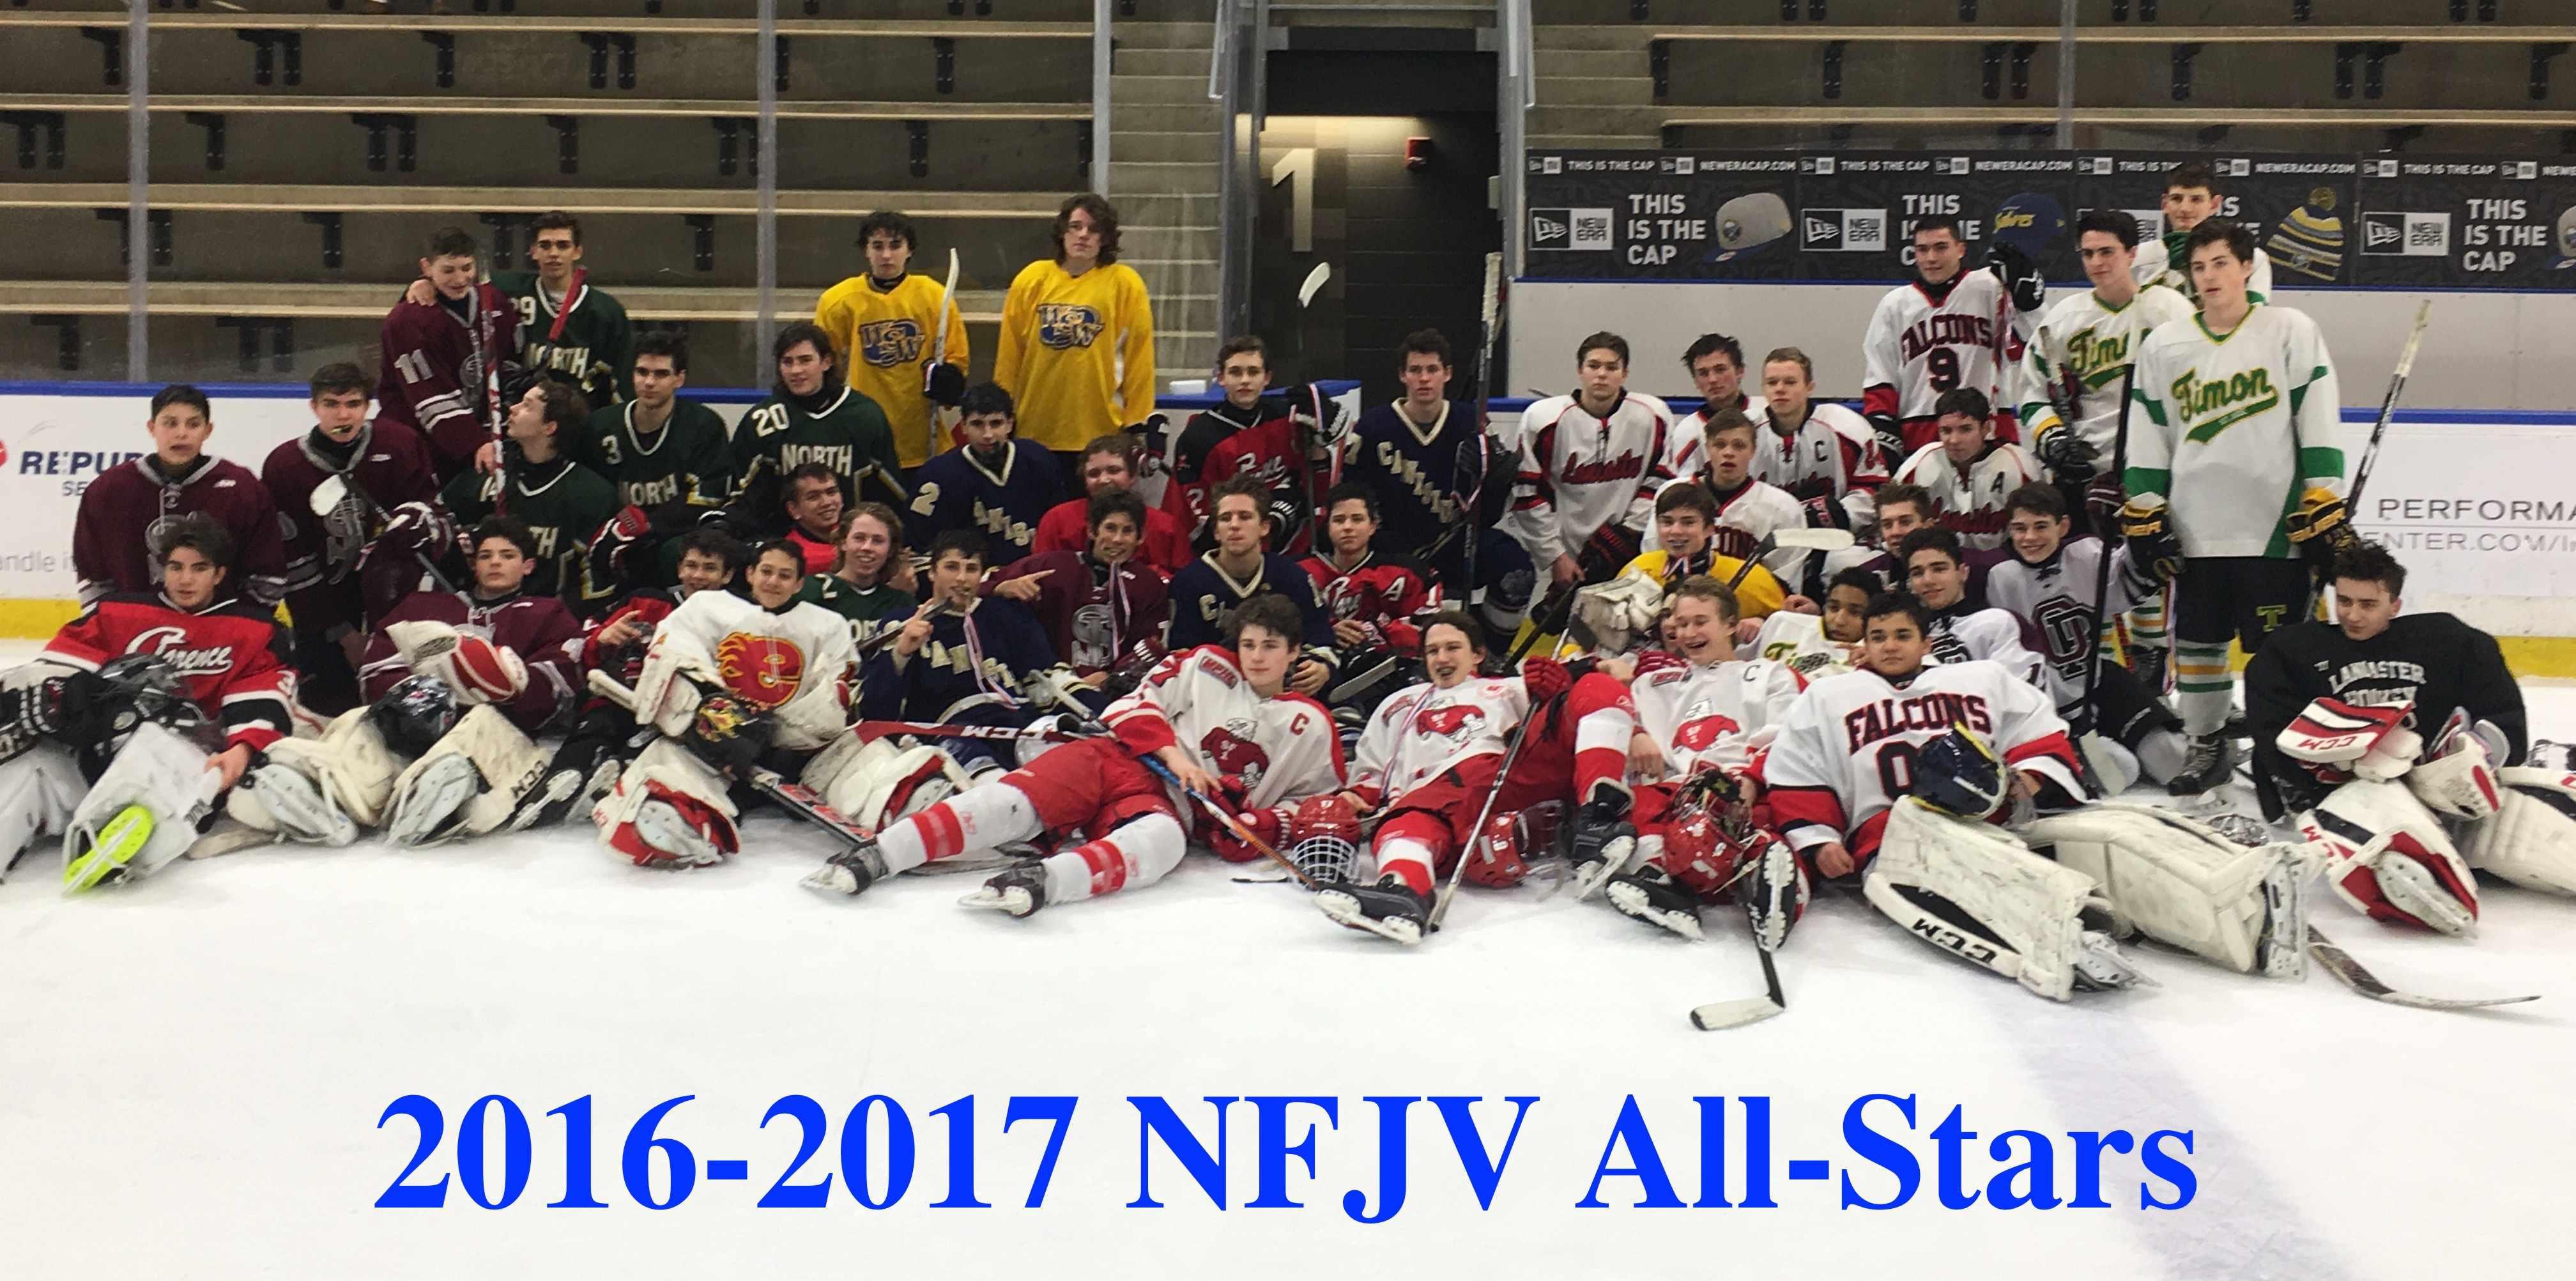 NFJV All-Stars 2016-2017